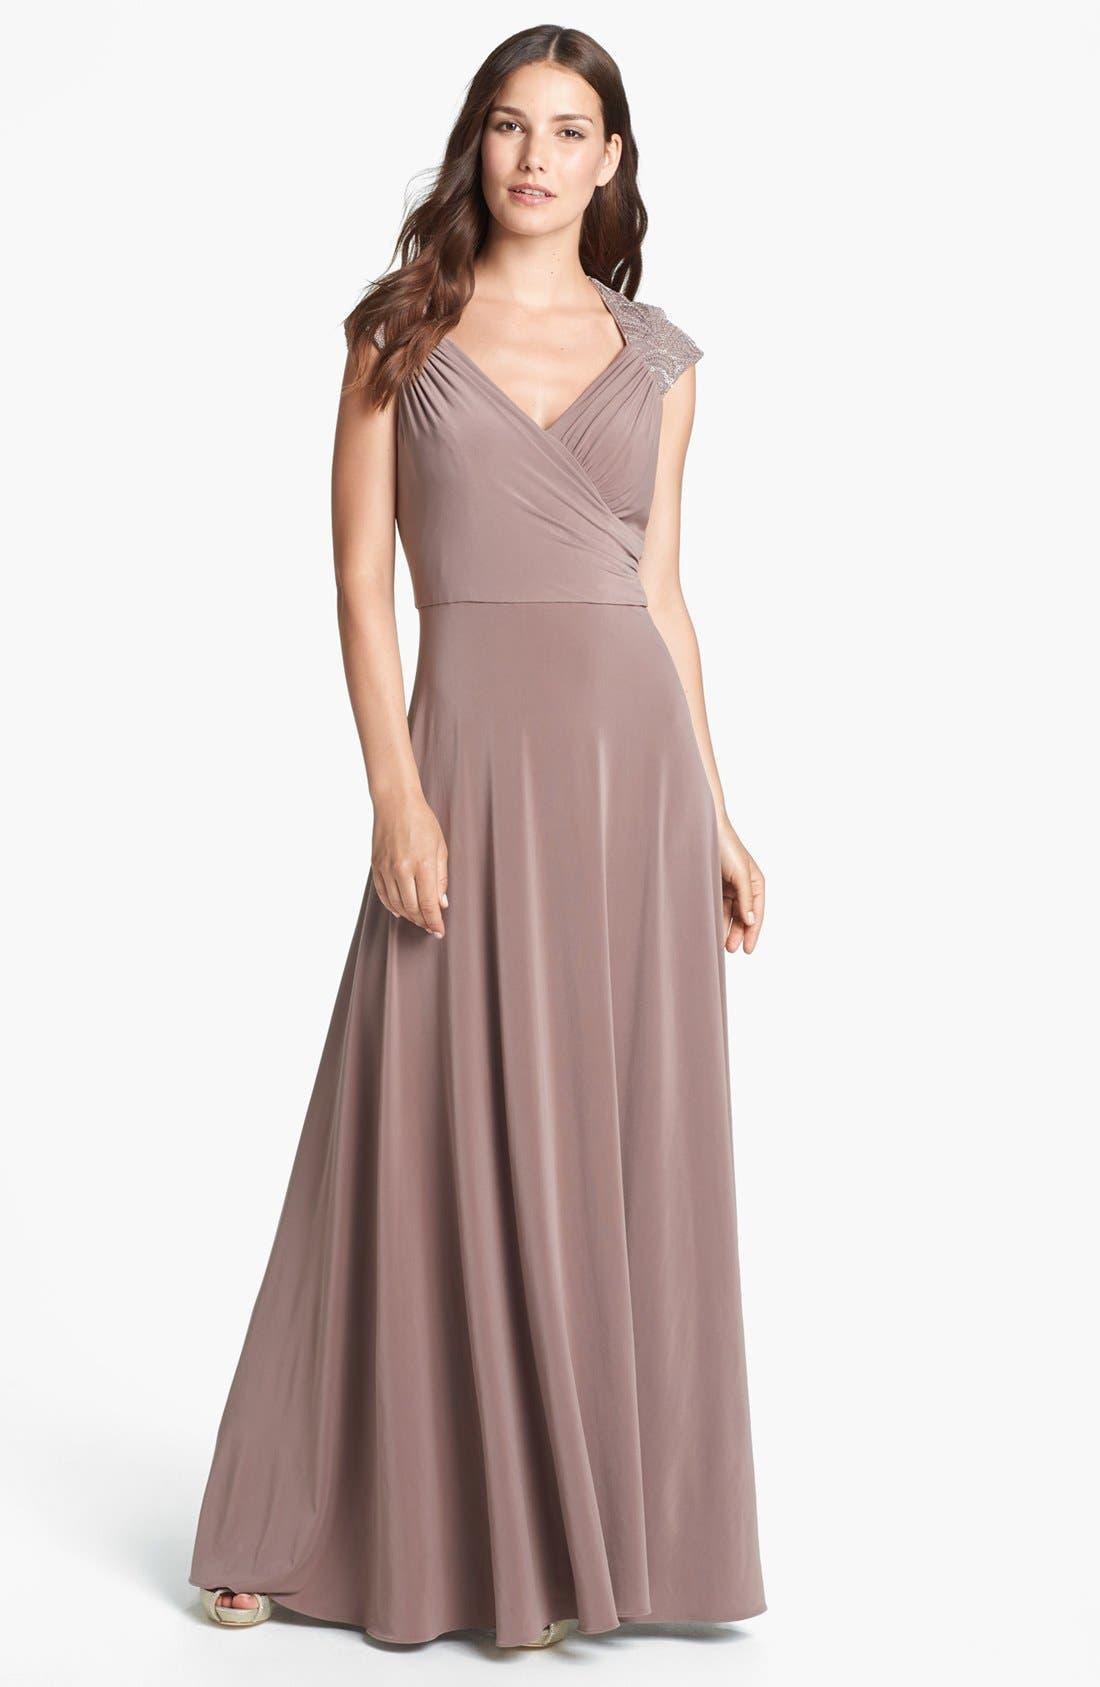 Alternate Image 1 Selected - Patra Embellished Sequin Yoke Jersey Gown (Regular & Petite)